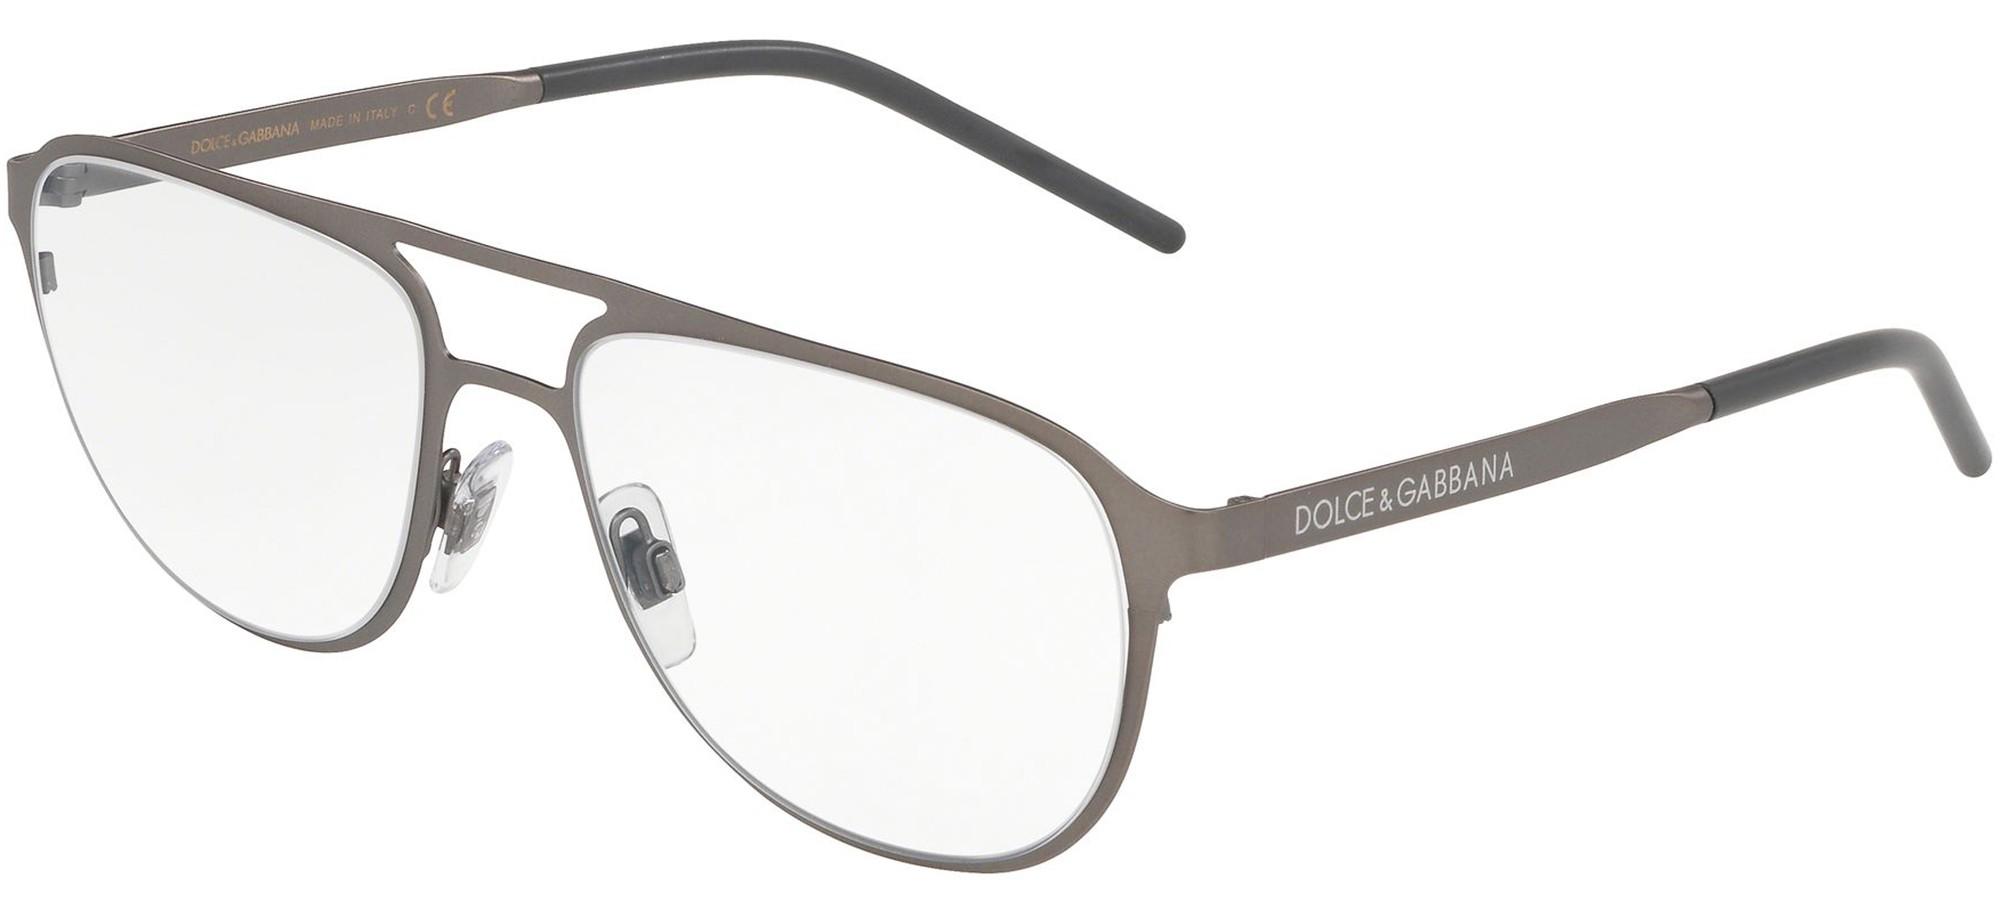 Dolce & Gabbana eyeglasses LOGO DG 1317